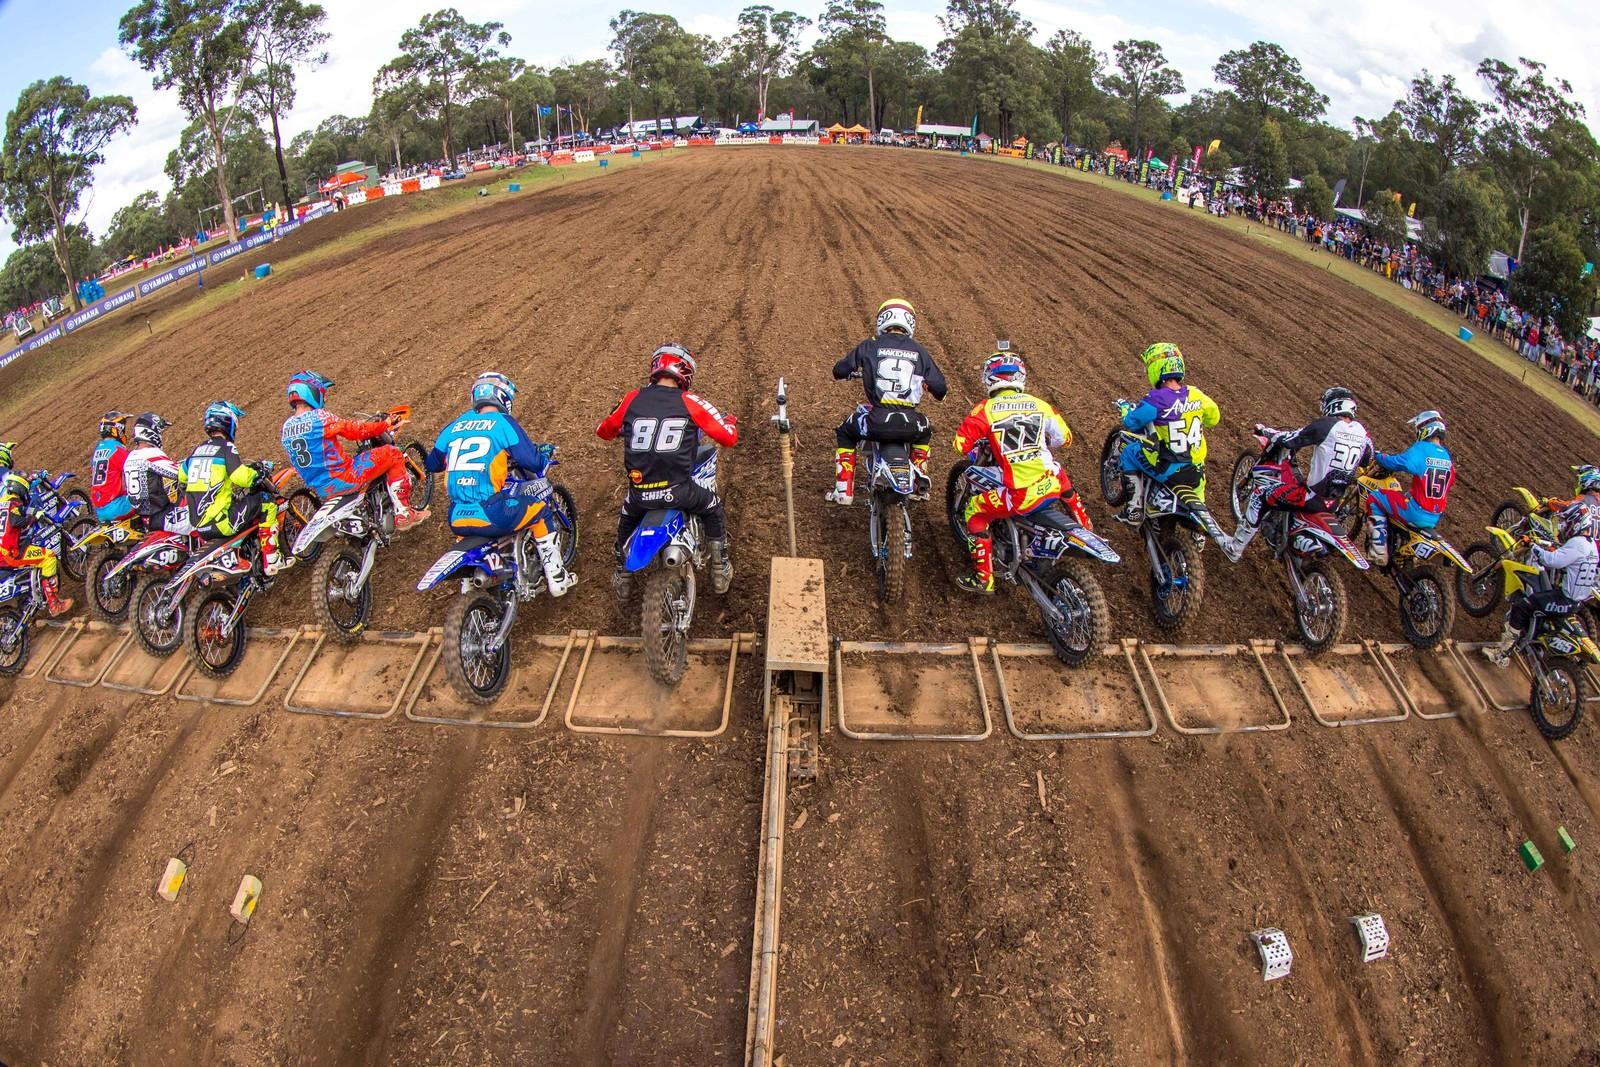 Kale Makeham - Australian Motul Motocross Nationals Round 2, Appin - Motocross Pictures - Vital MX